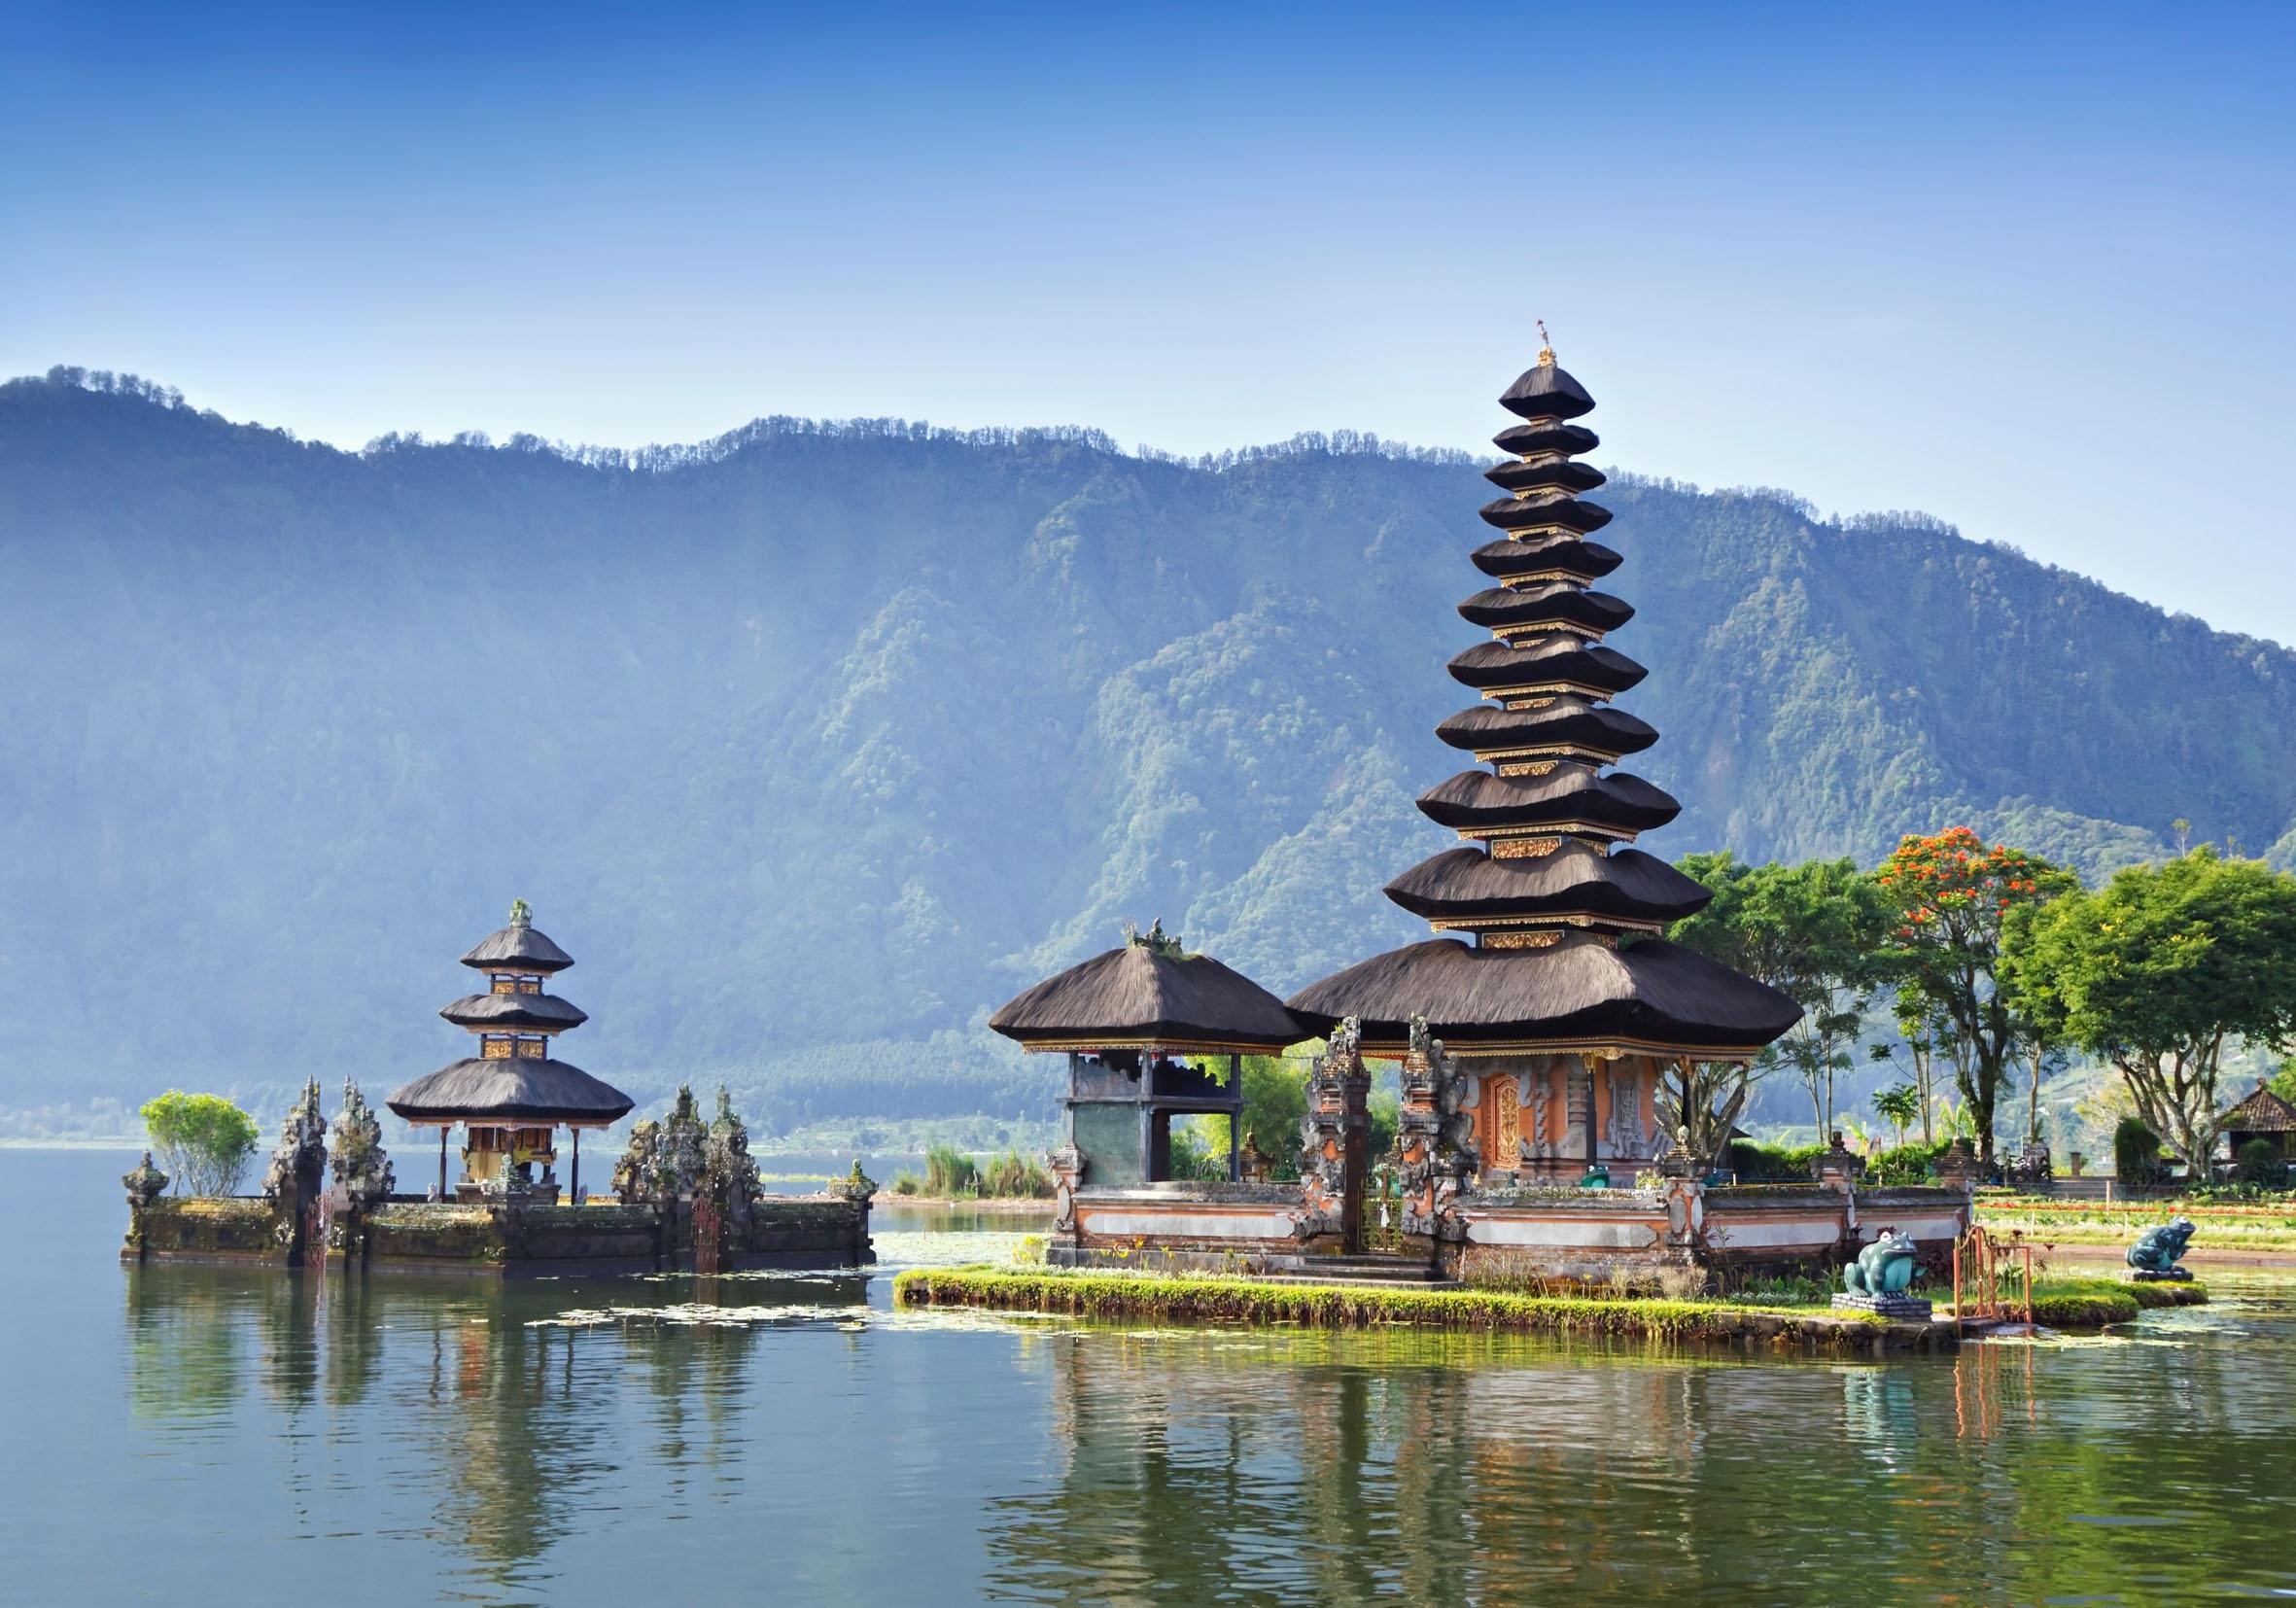 LT_ ĐẢO BALI - INDONESIA